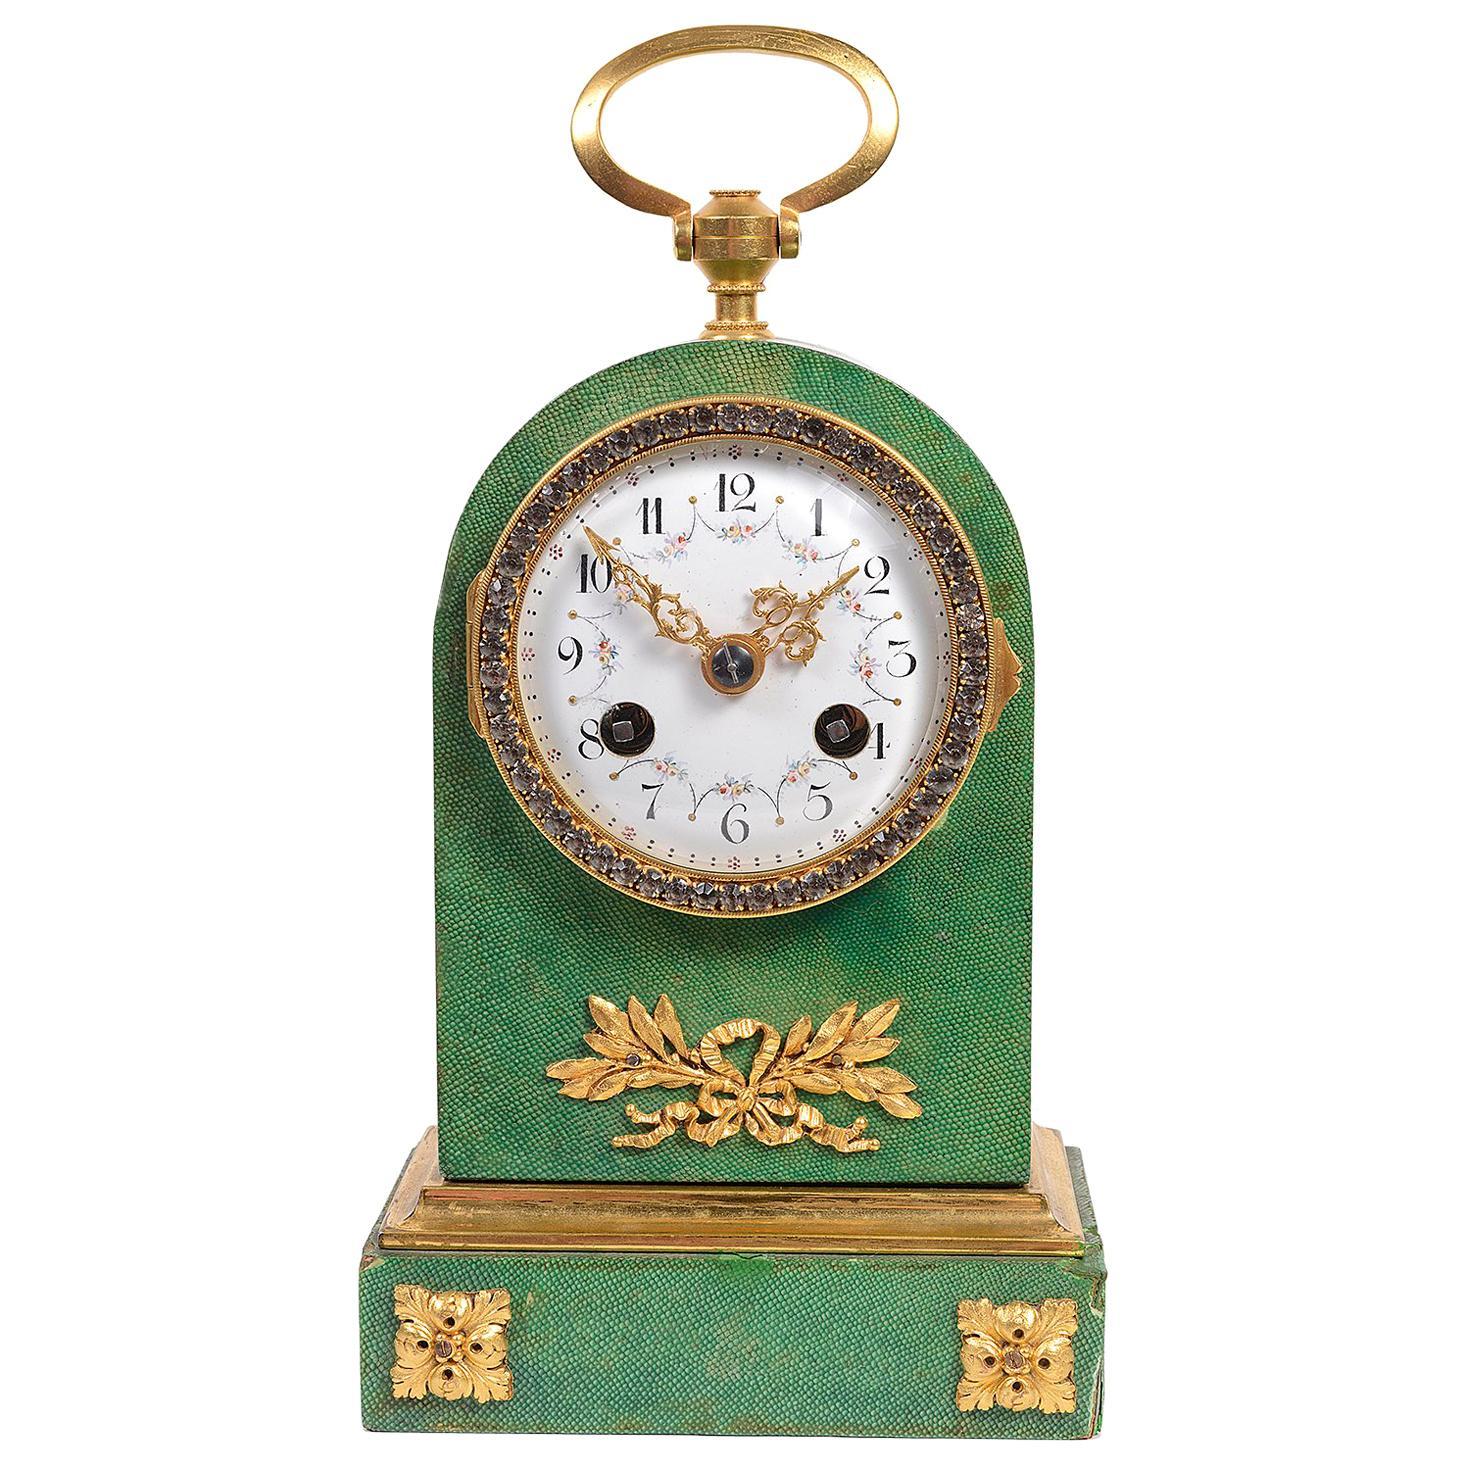 Shagreen and Ormolu Mantel Clock, circa 1900